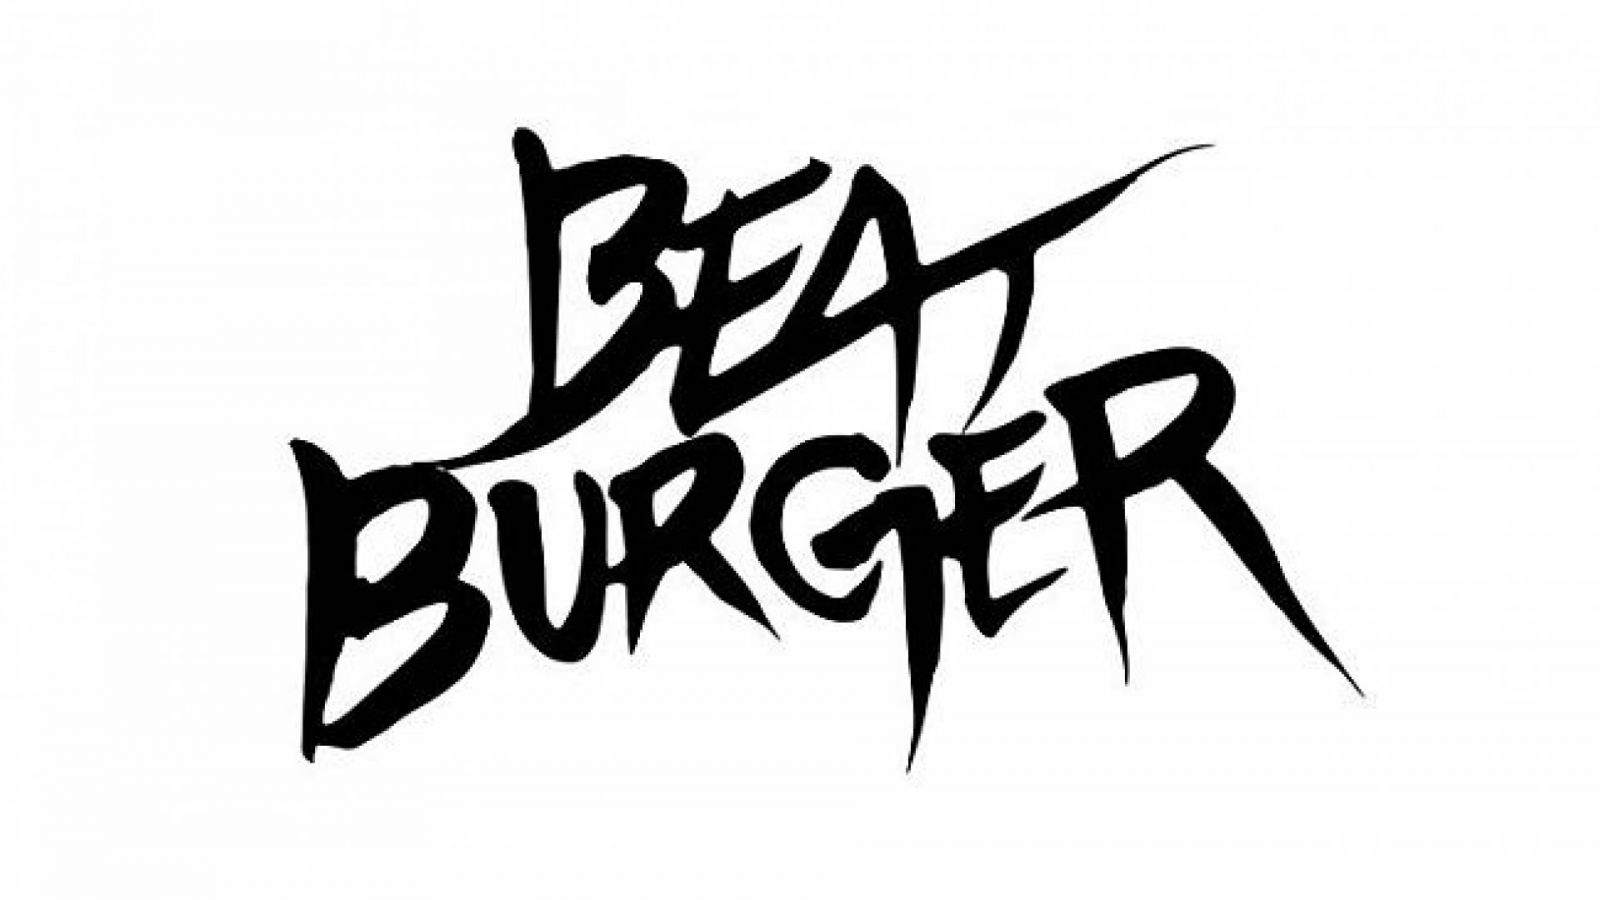 Beatburger julkaisi ensimmäisen minialbuminsa © Beatburger Official Facebook Page